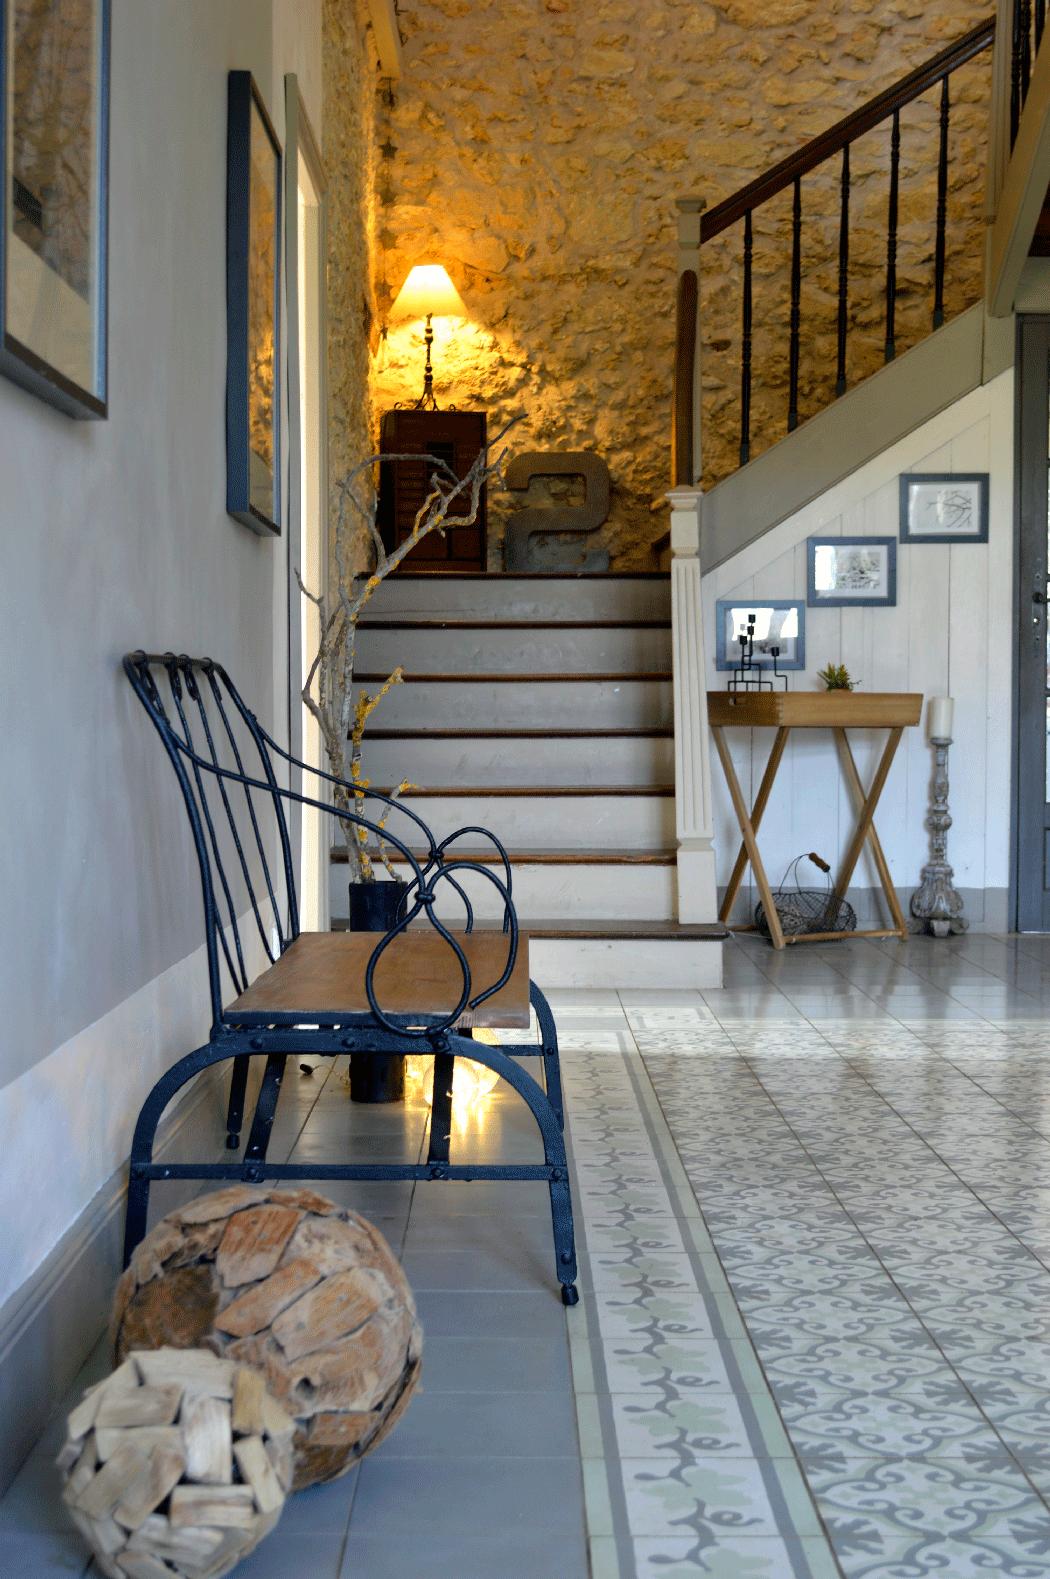 entr e maison ancienne gers 32 saurin decoration. Black Bedroom Furniture Sets. Home Design Ideas